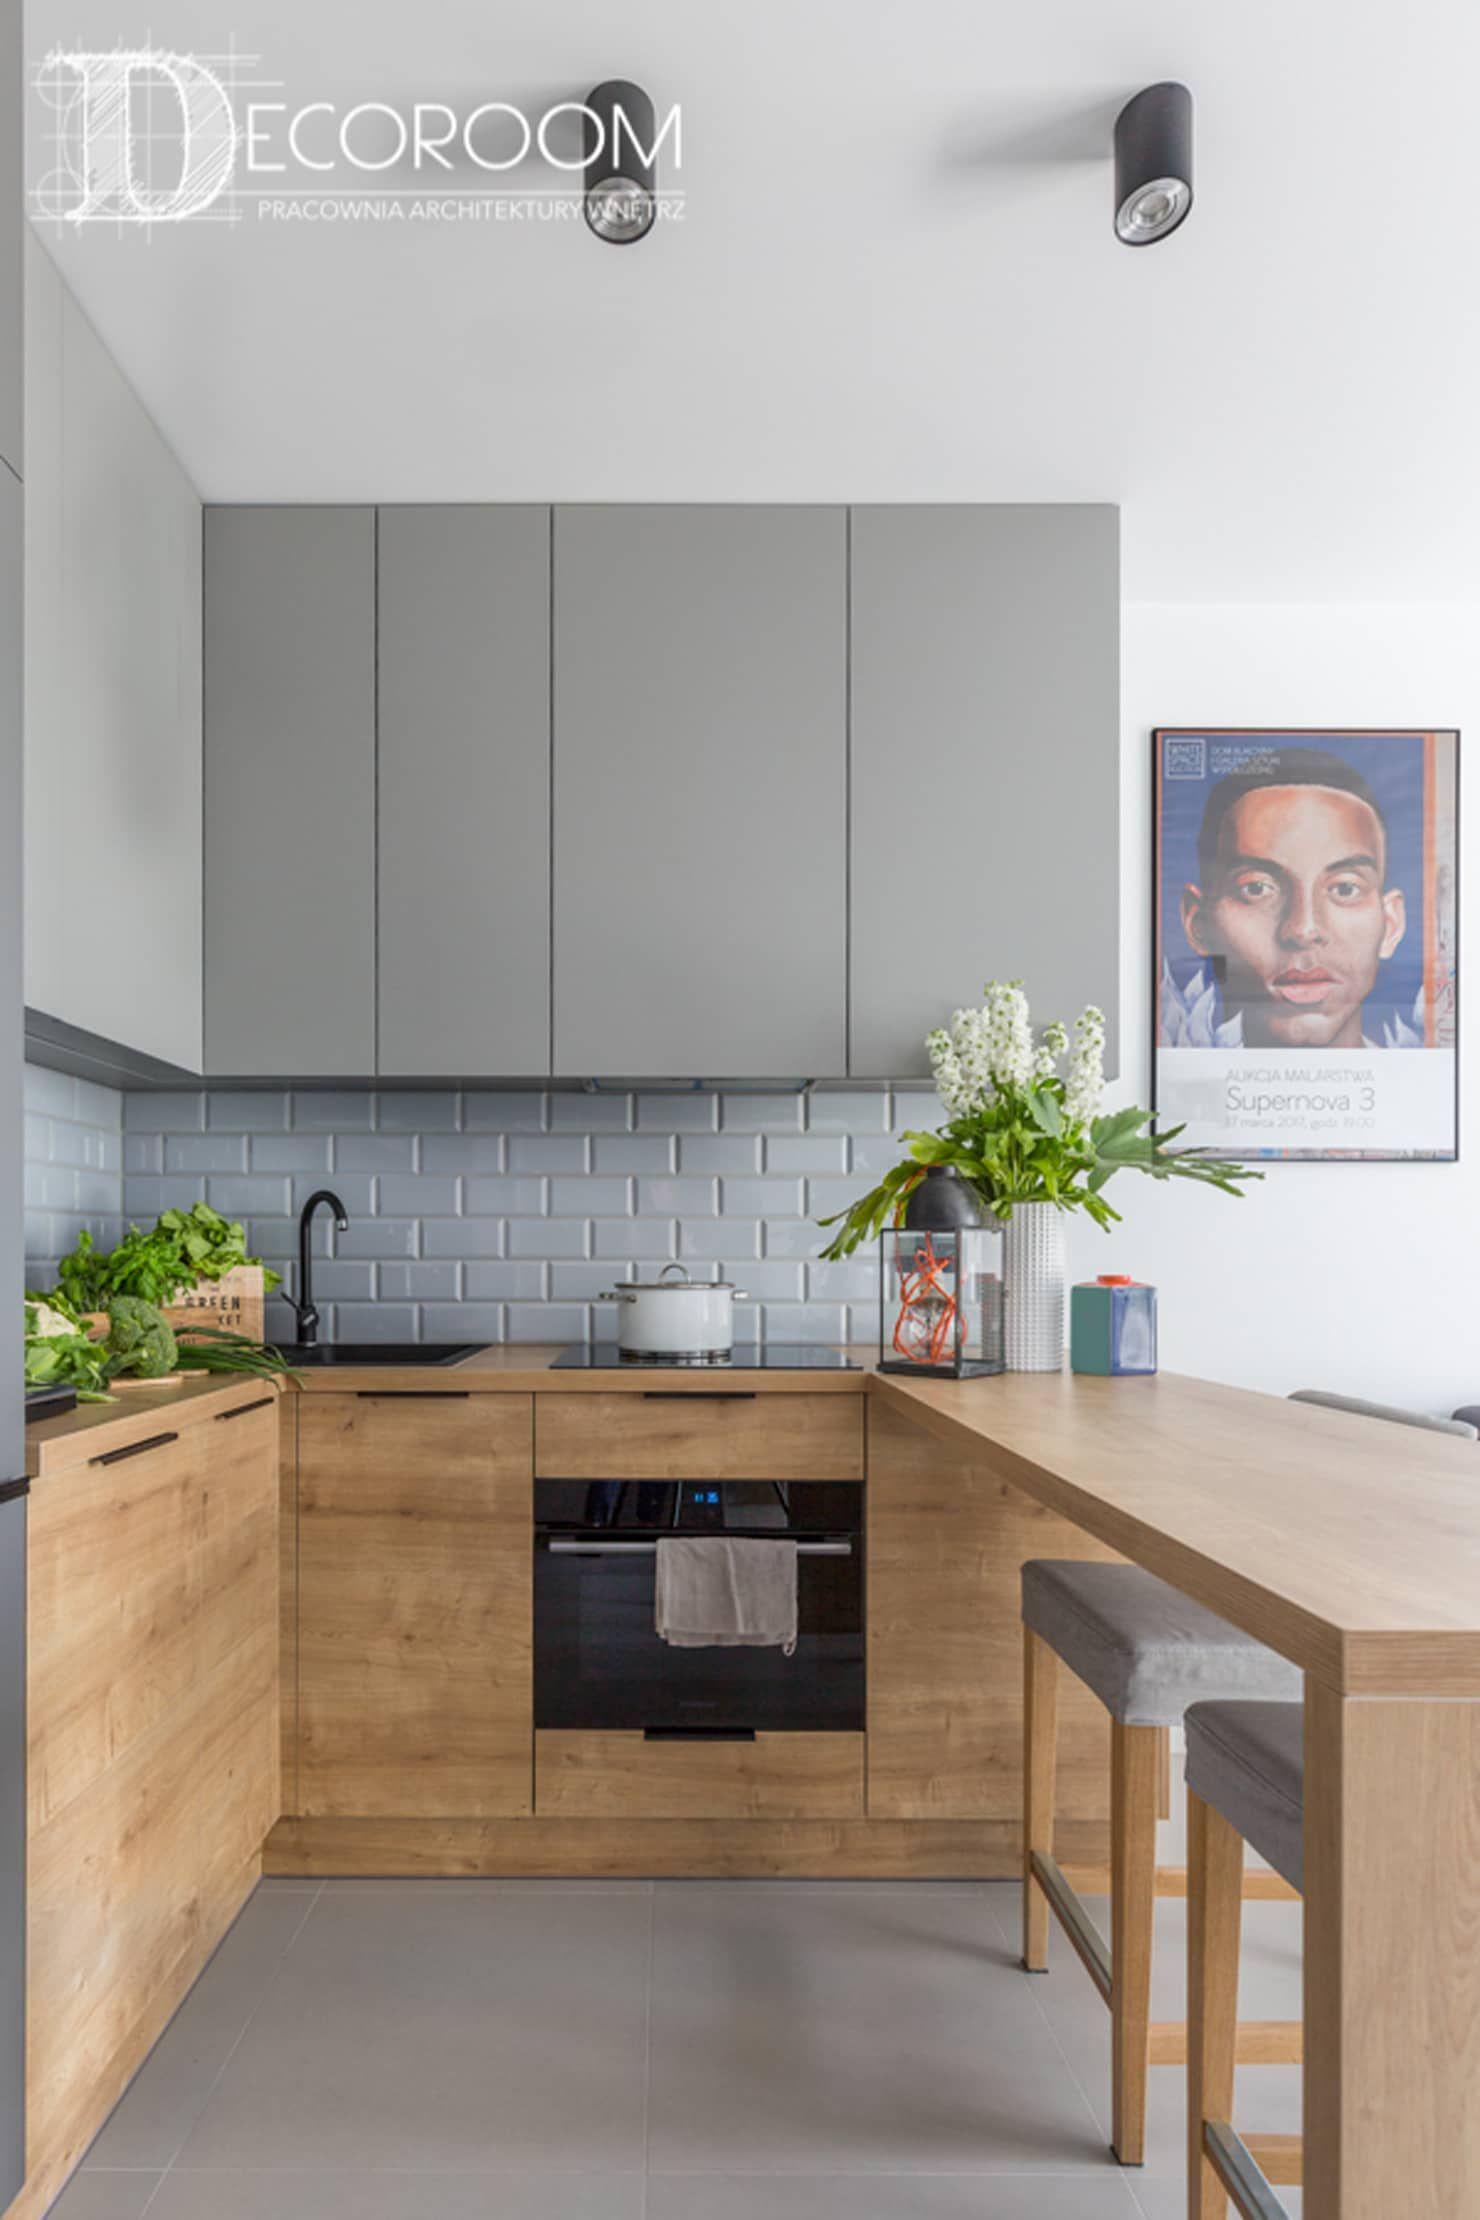 Kawalerka Dla Singla Pracownia Architektury Wnetrz Decoroom Nowoczesna Kuchnia Szary Homify Kitchen Remodel Small Kitchen Design Small Kitchen Interior